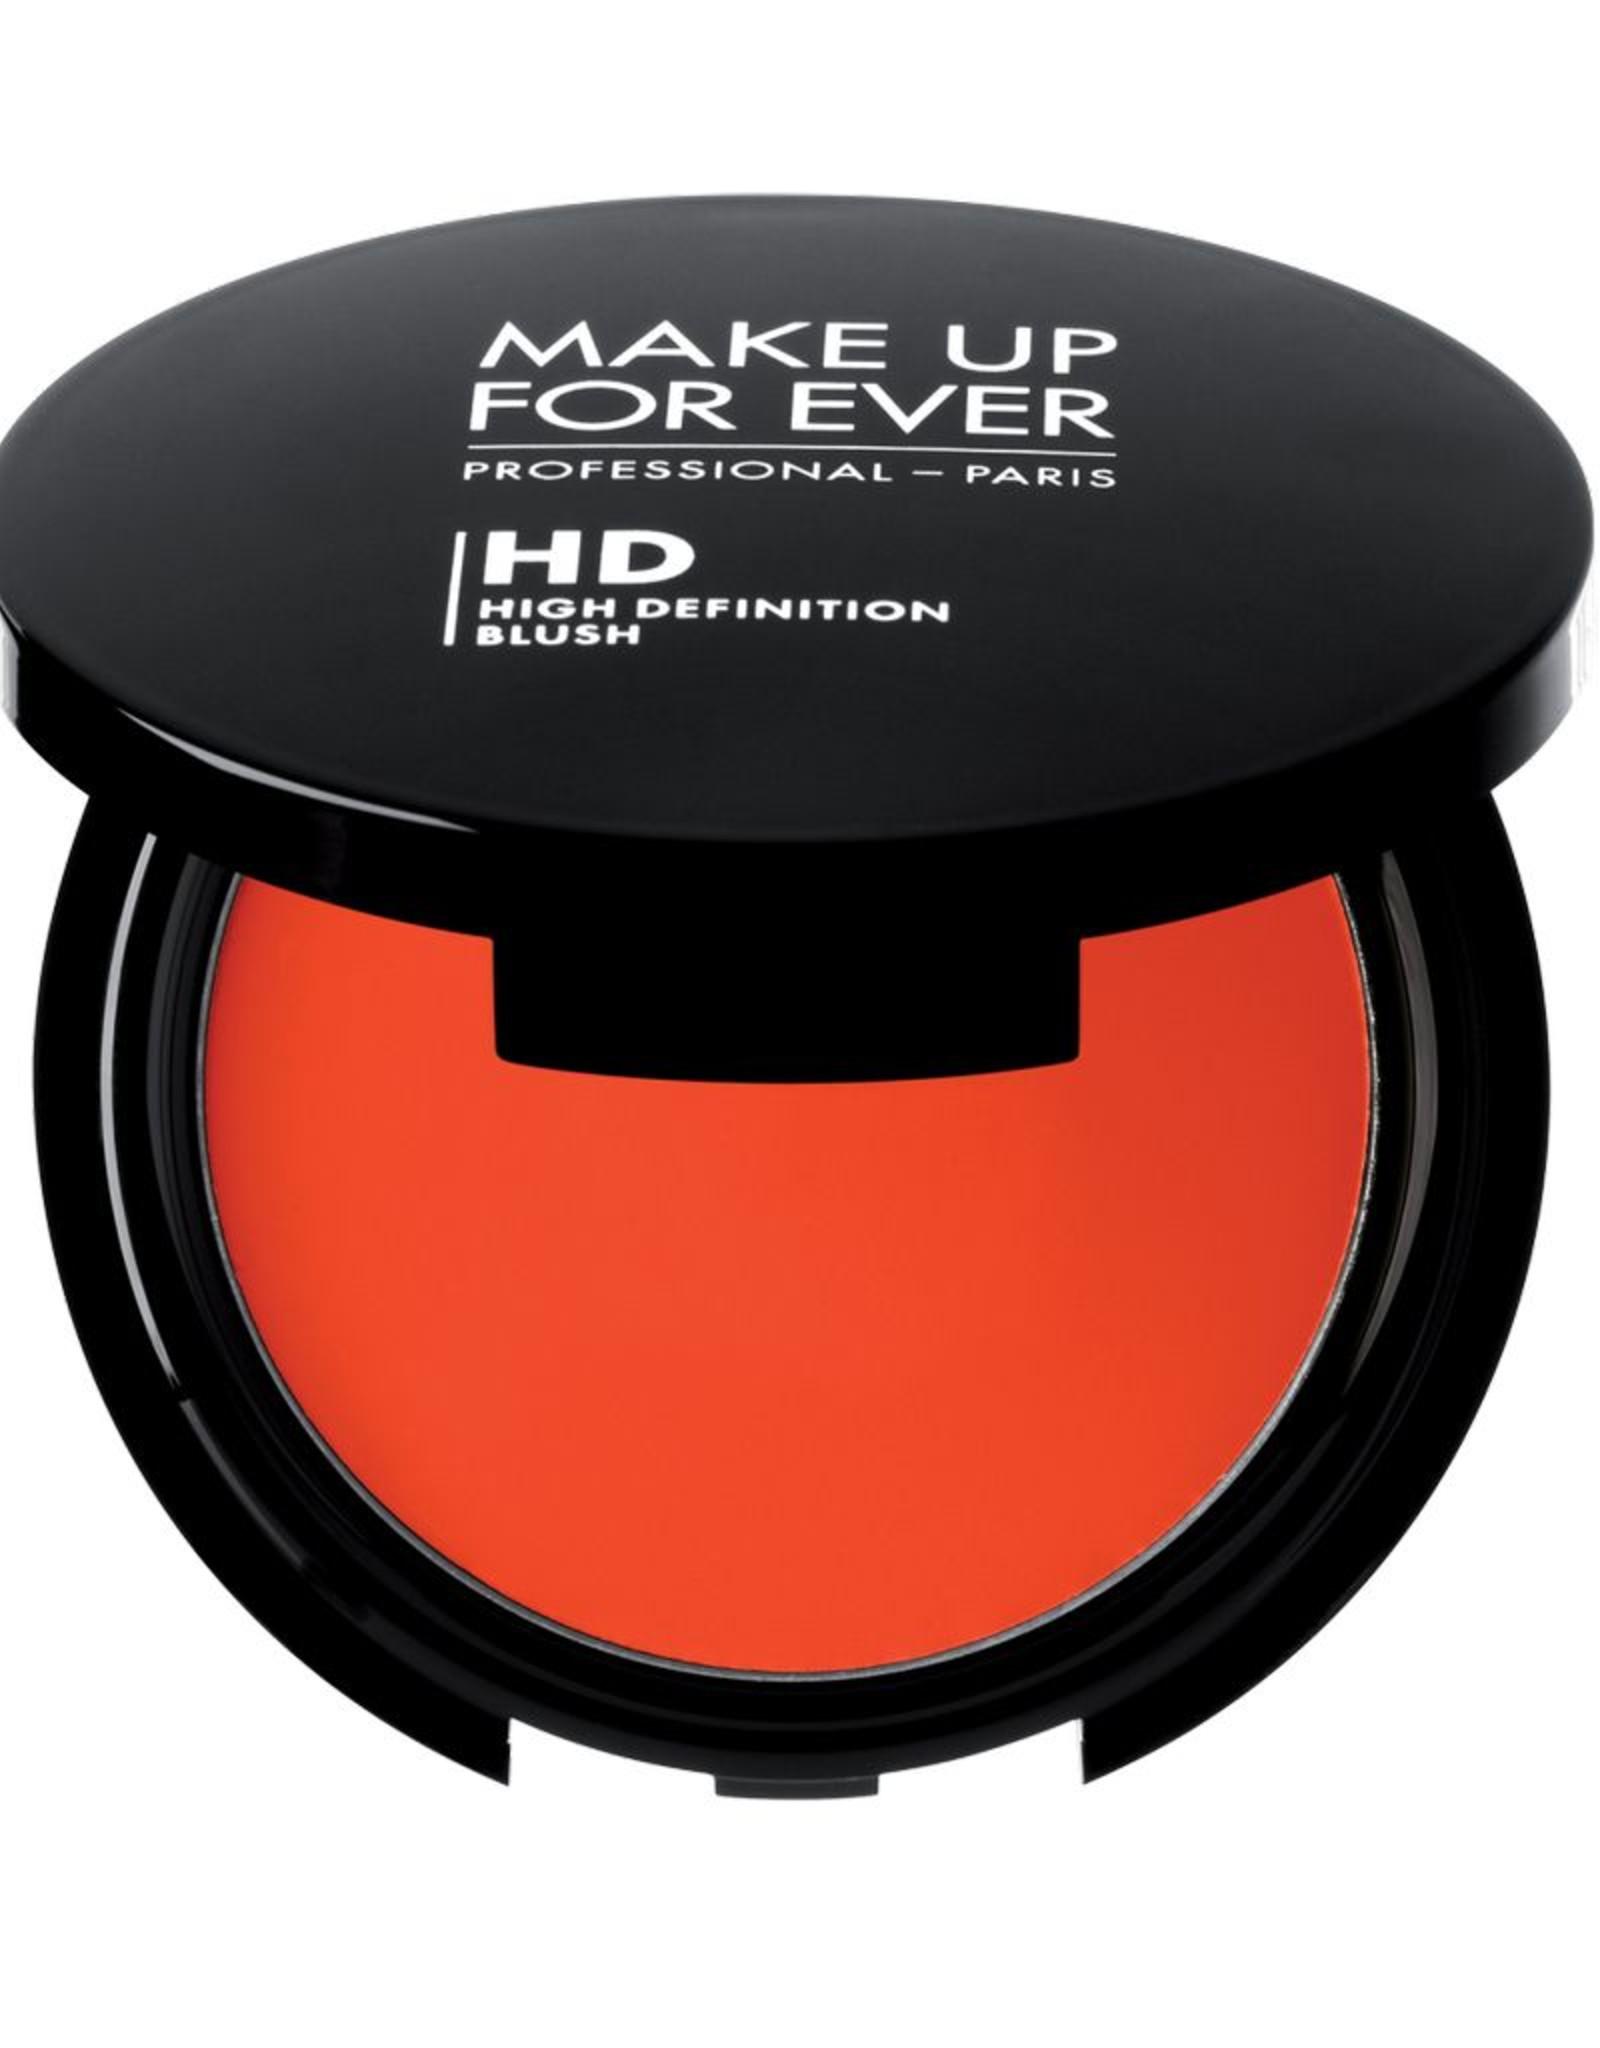 MUFE HD BLUSH CREME 2.8G#515: Tangerine